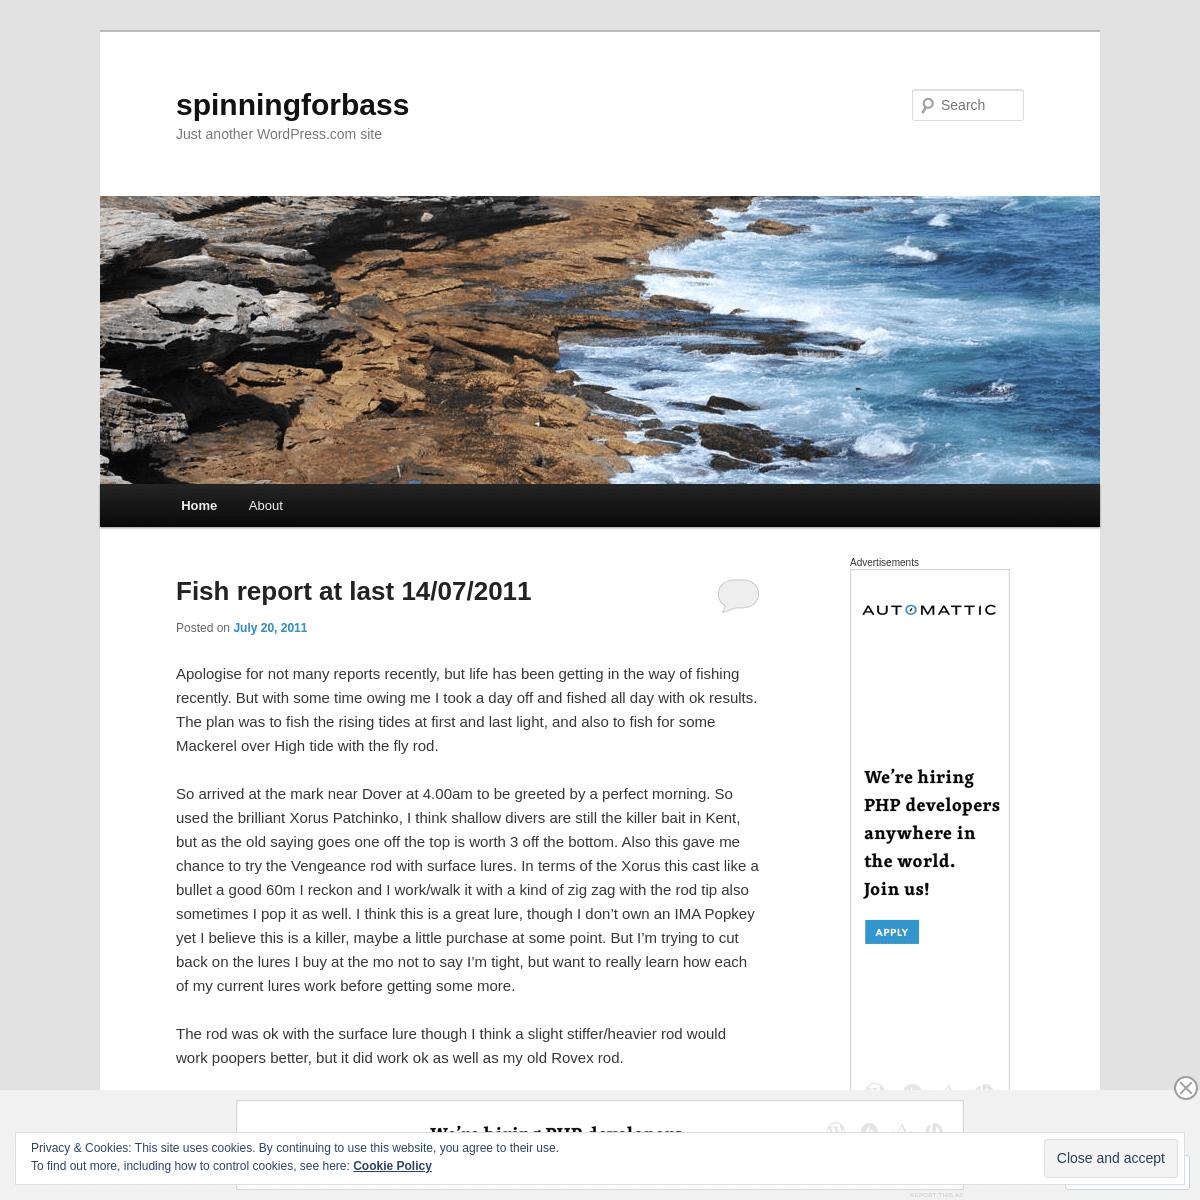 spinningforbass - Just another WordPress.com site